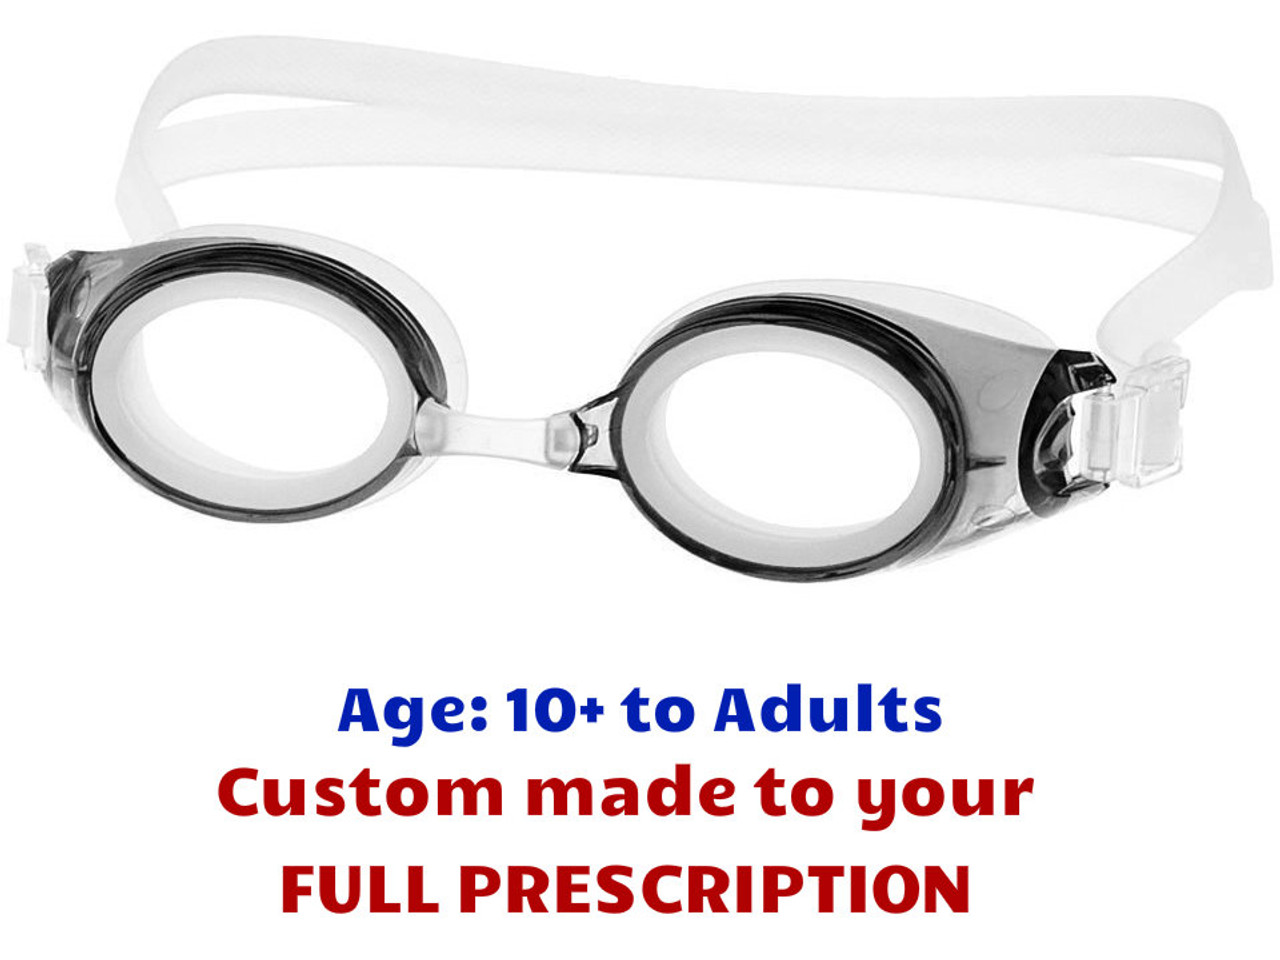 d8330fe1972 M2P Prescription Swim Goggles (Custom Made to Prescription) Grey ...